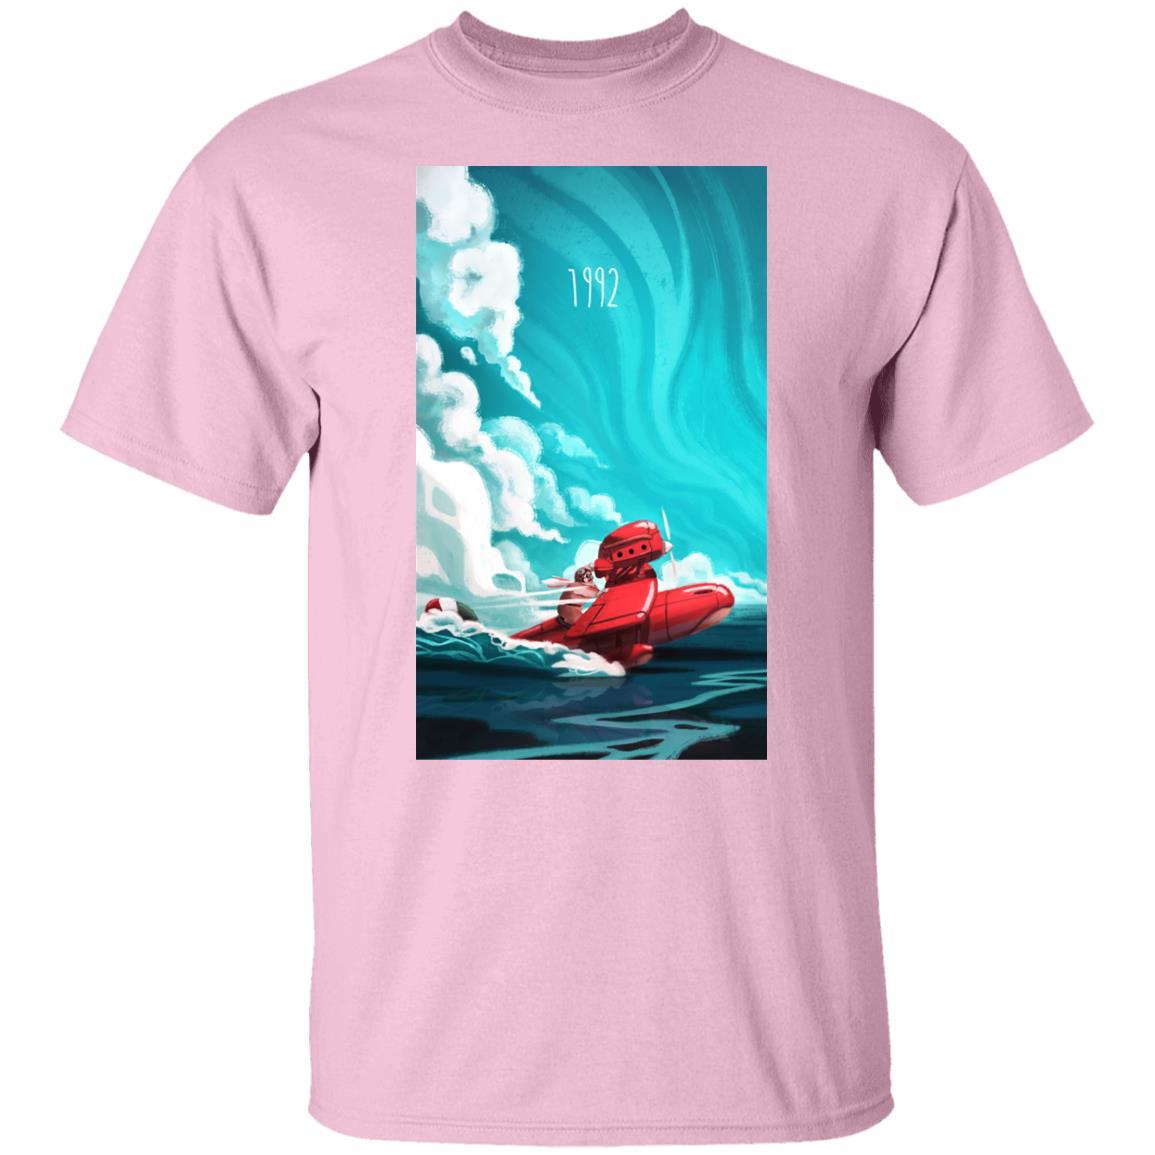 Porco Rosso 1982 Illustration T Shirt